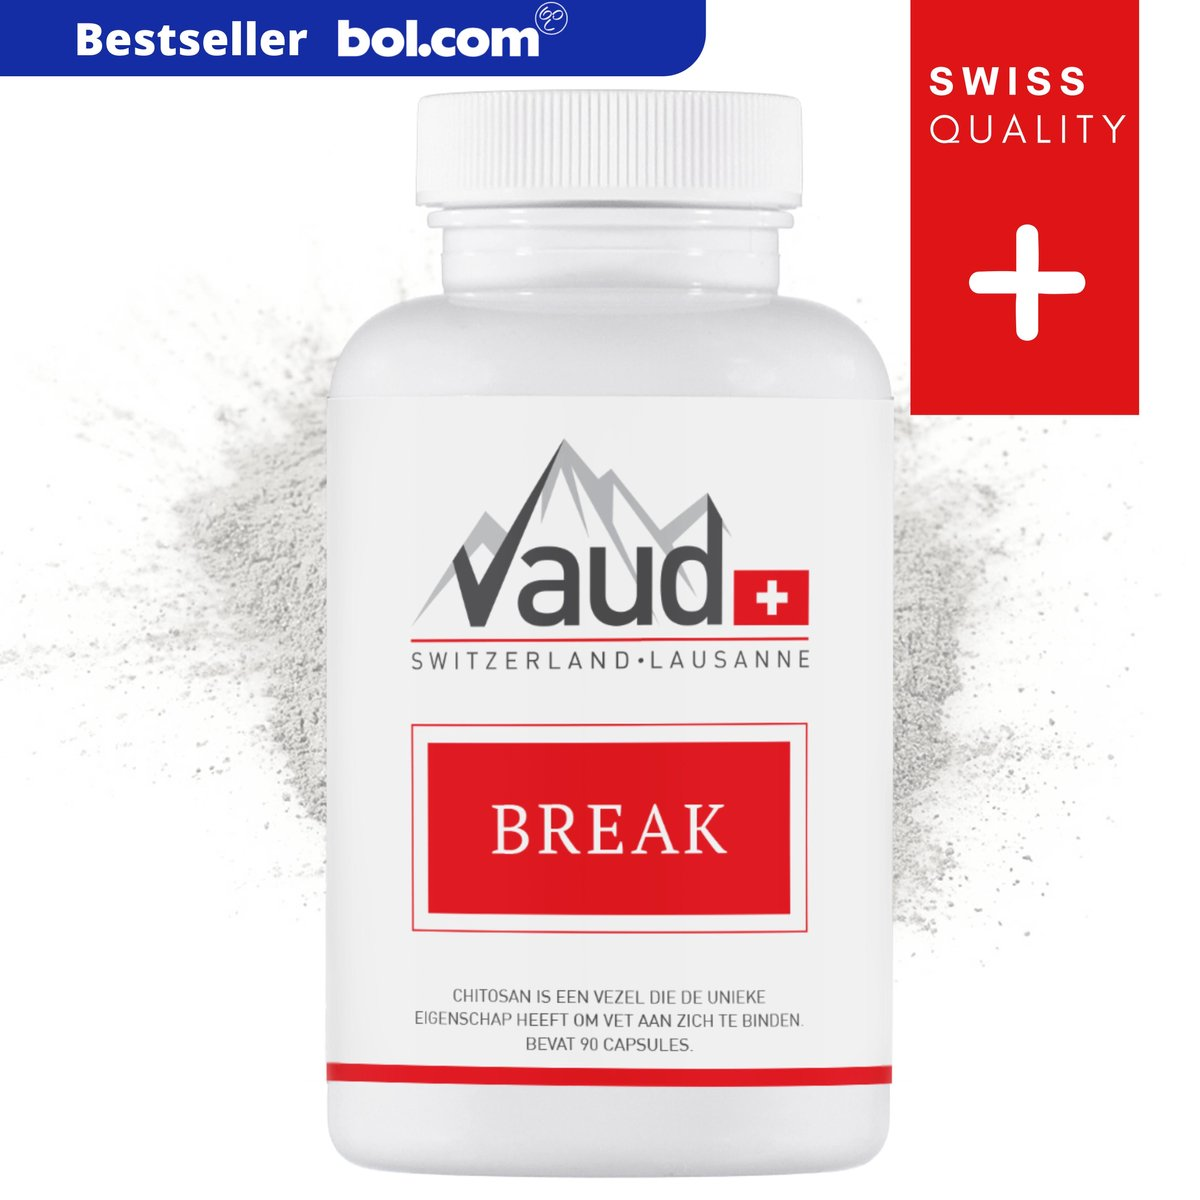 Vaud   Break   90 Capsules   1500mg chitosan   Afvallen   Afslank product   Afval pillen   Fatburner